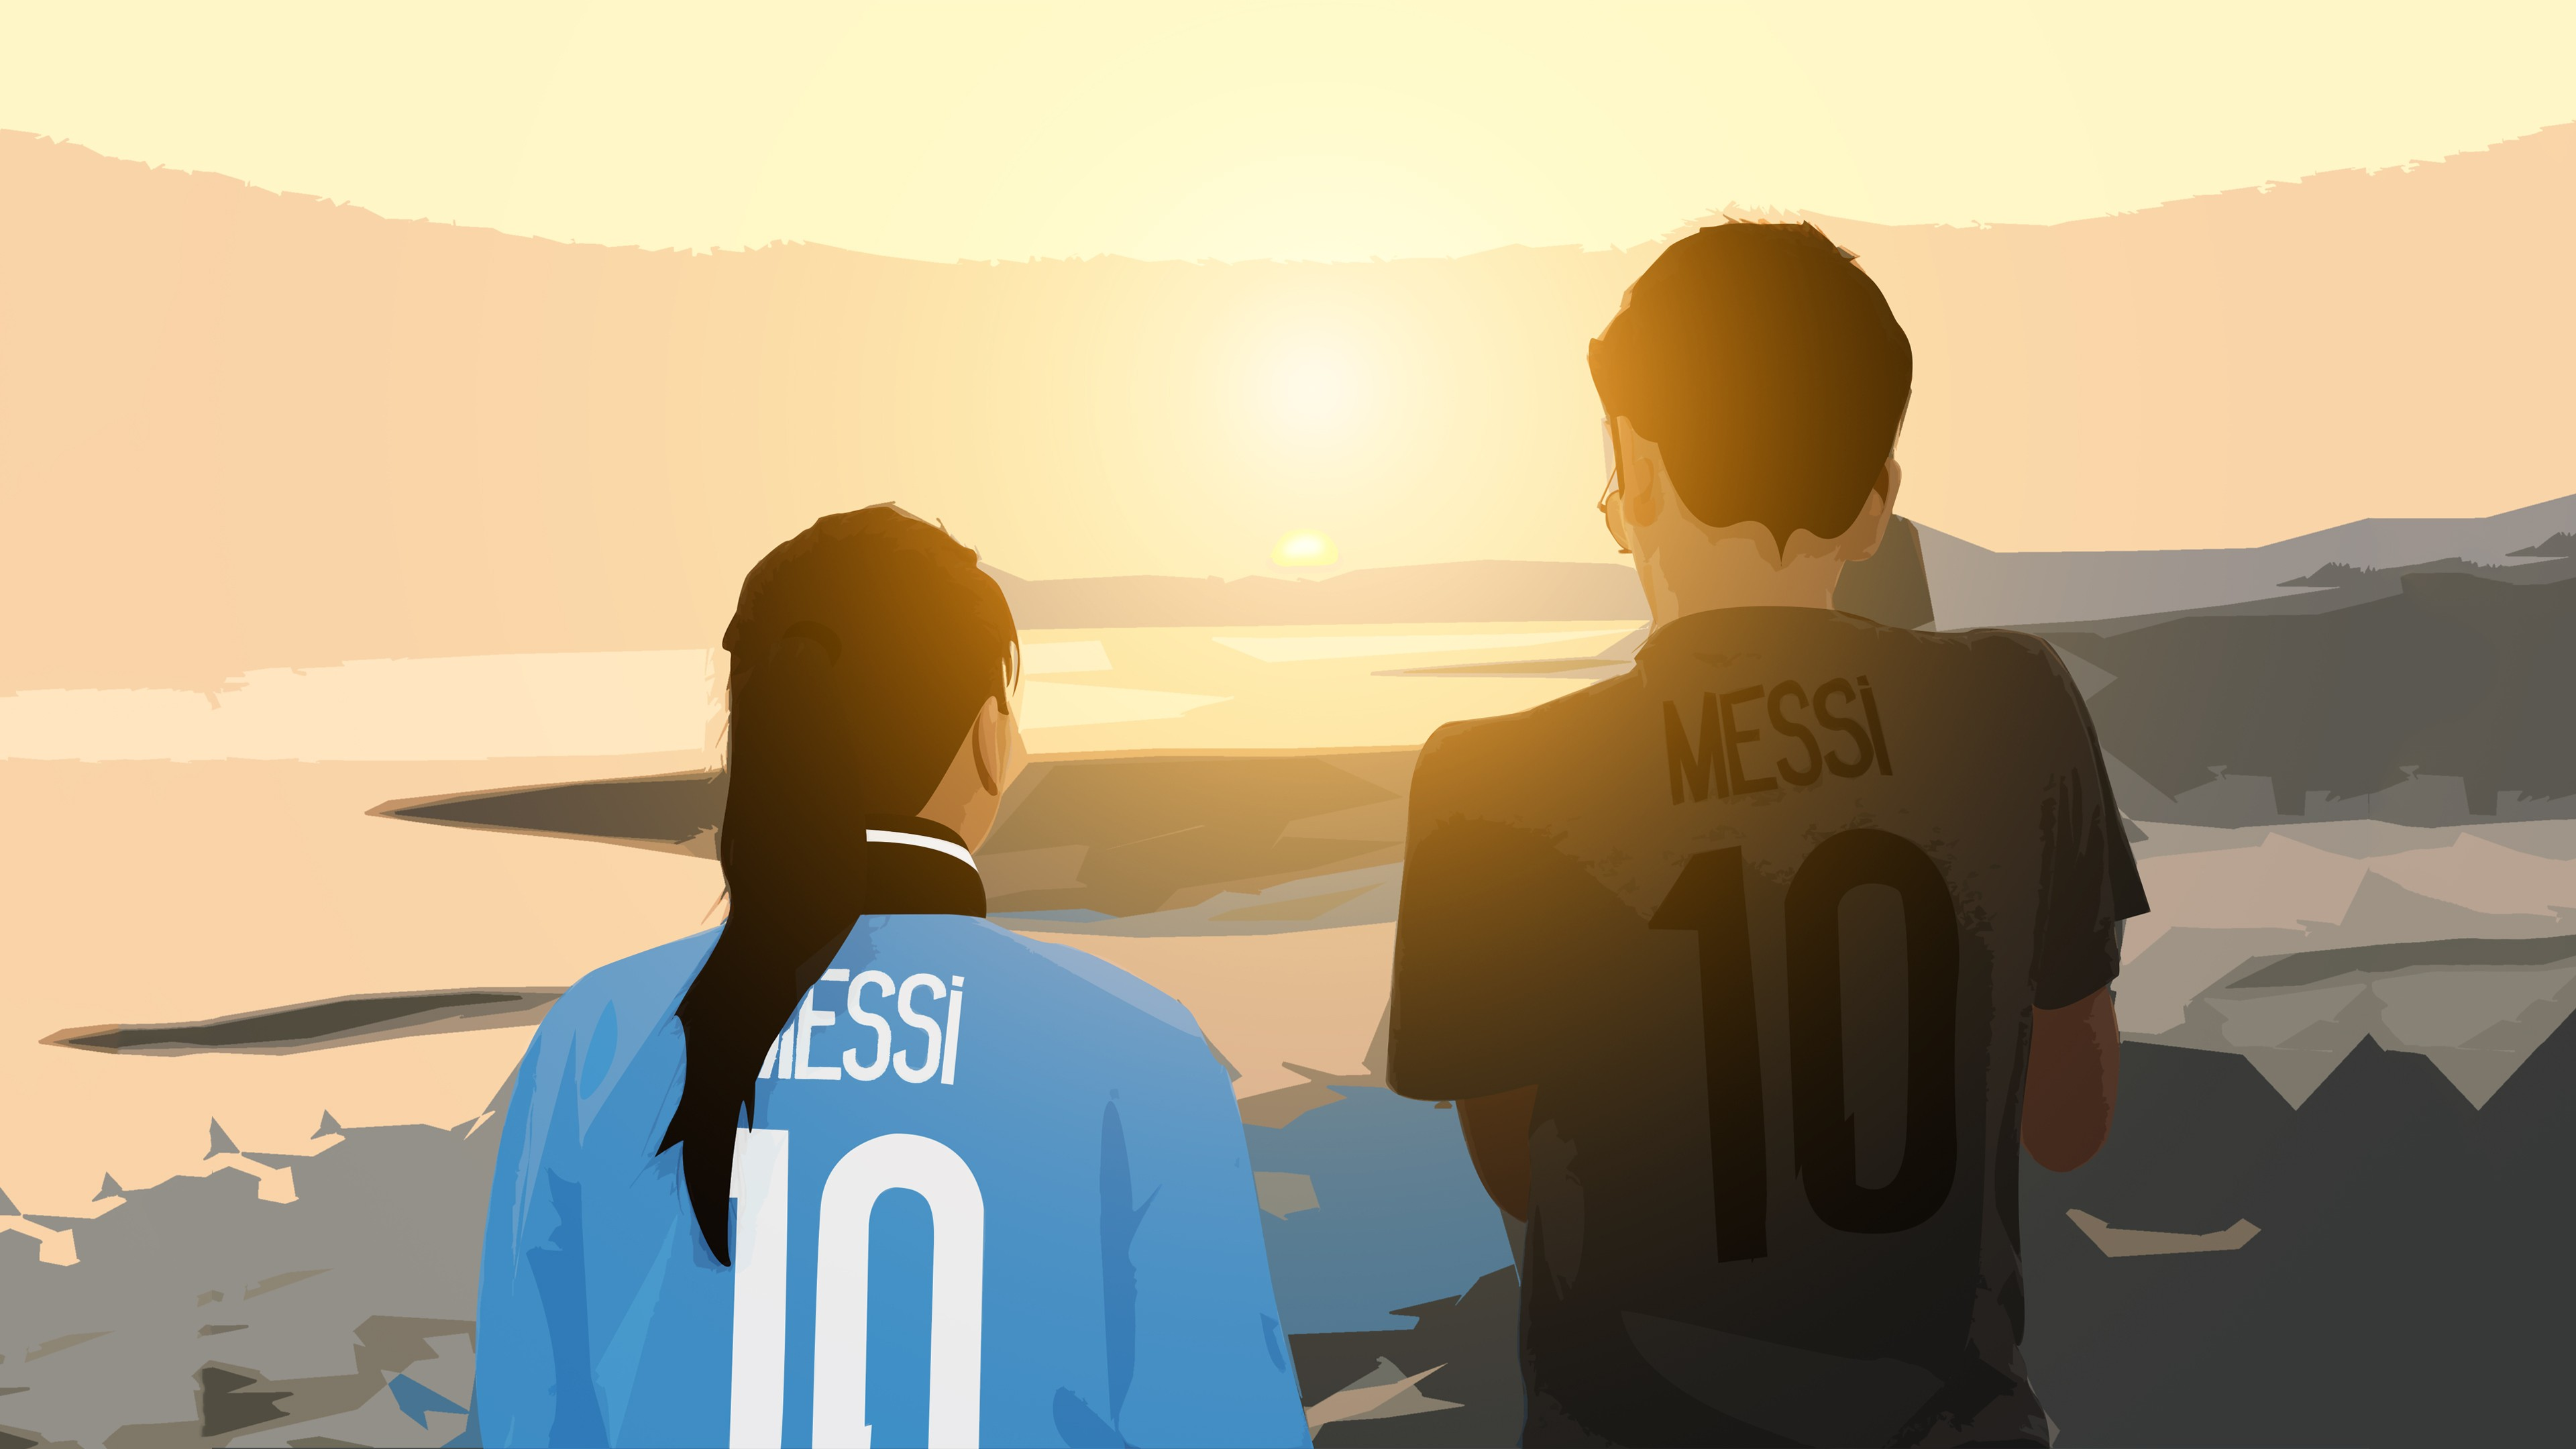 messi digital art 1538786733 - Messi Digital Art - sports wallpapers, Lionel Messi wallpapers, leo messi wallpapers, football wallpapers, fcb wallpapers, fc barcelona wallpapers